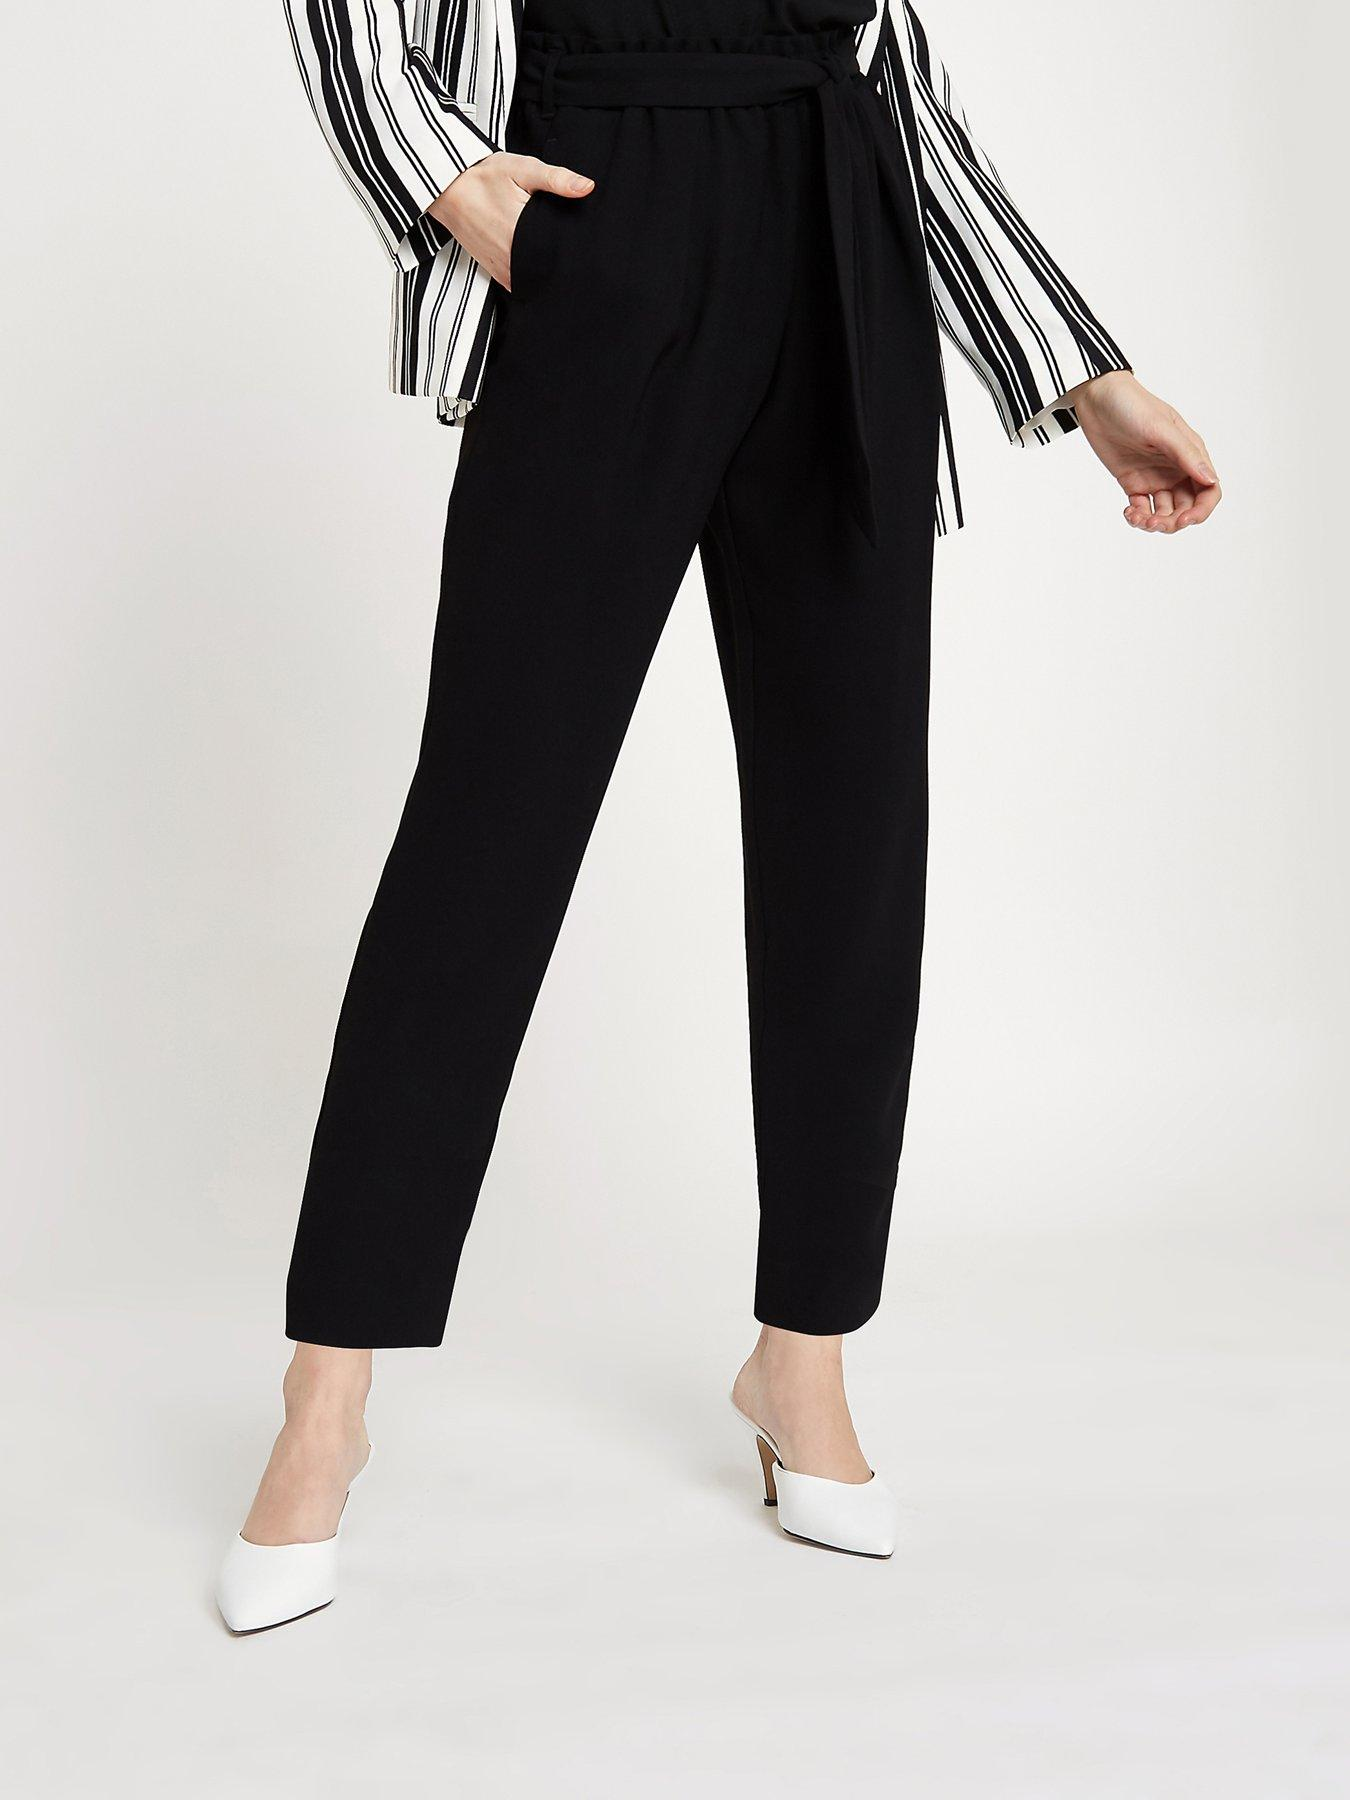 RI Petite Ri Petite Tie Waist Tapered Trousers- Black